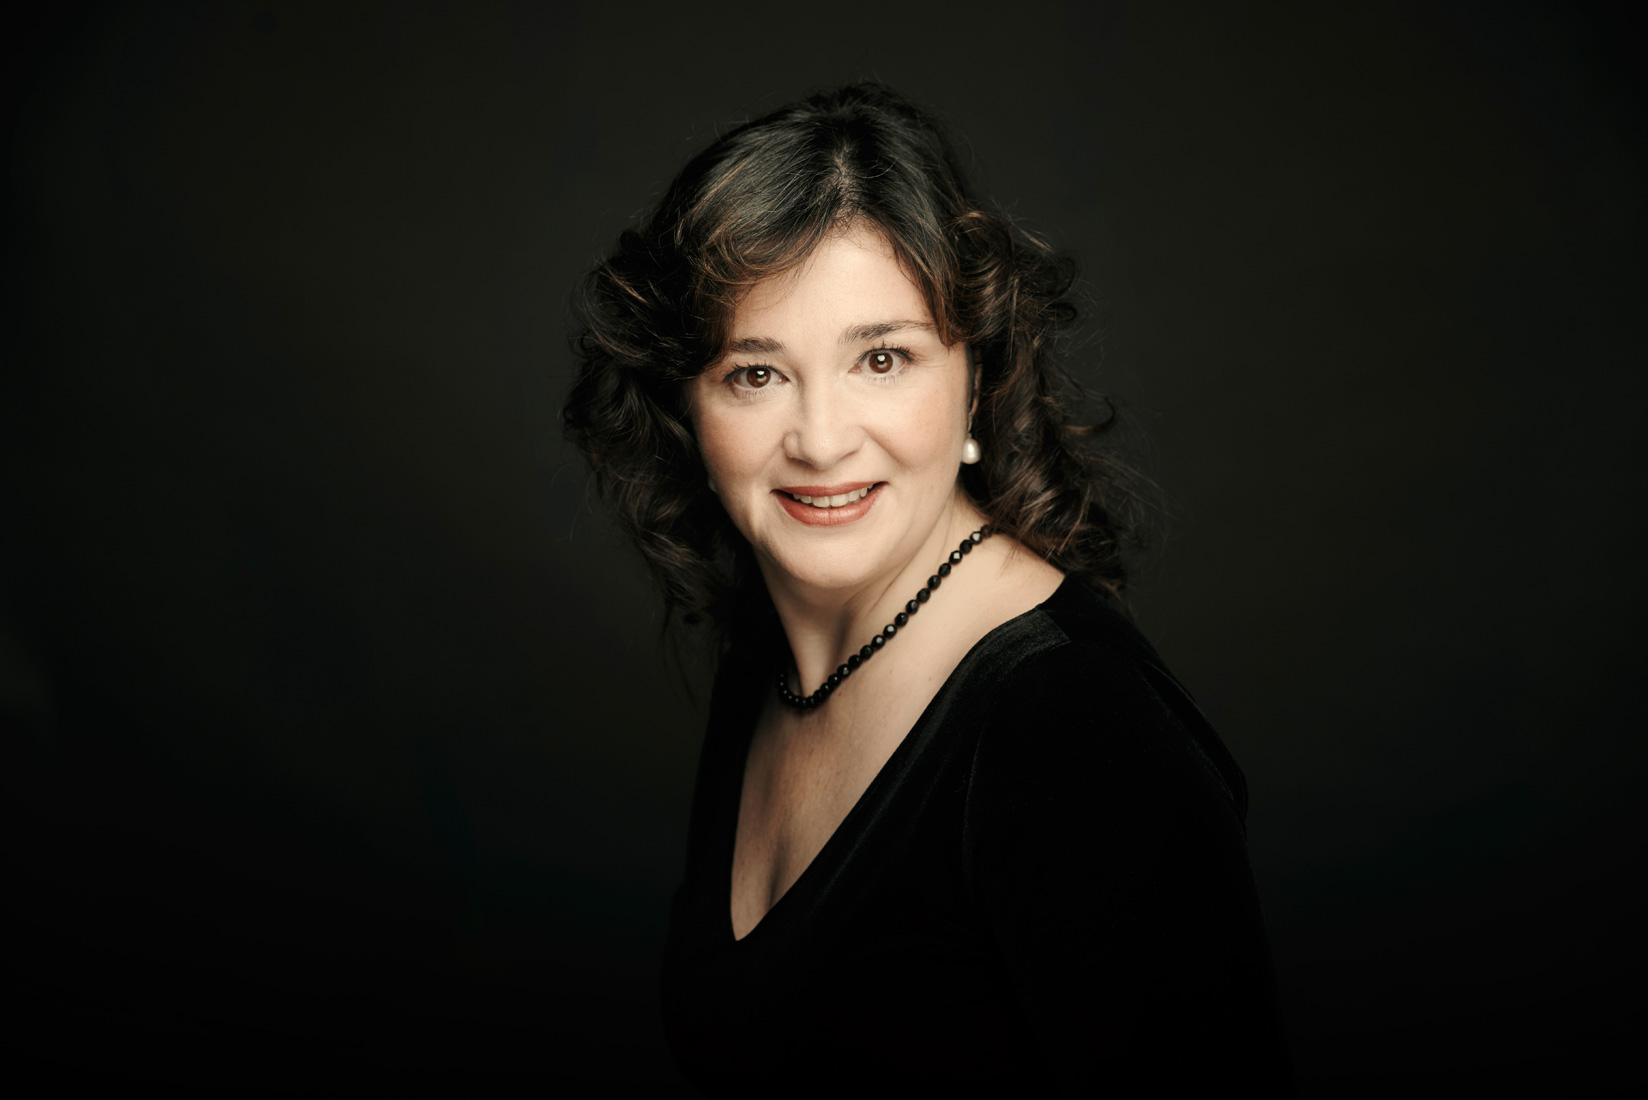 Raquel Momblant